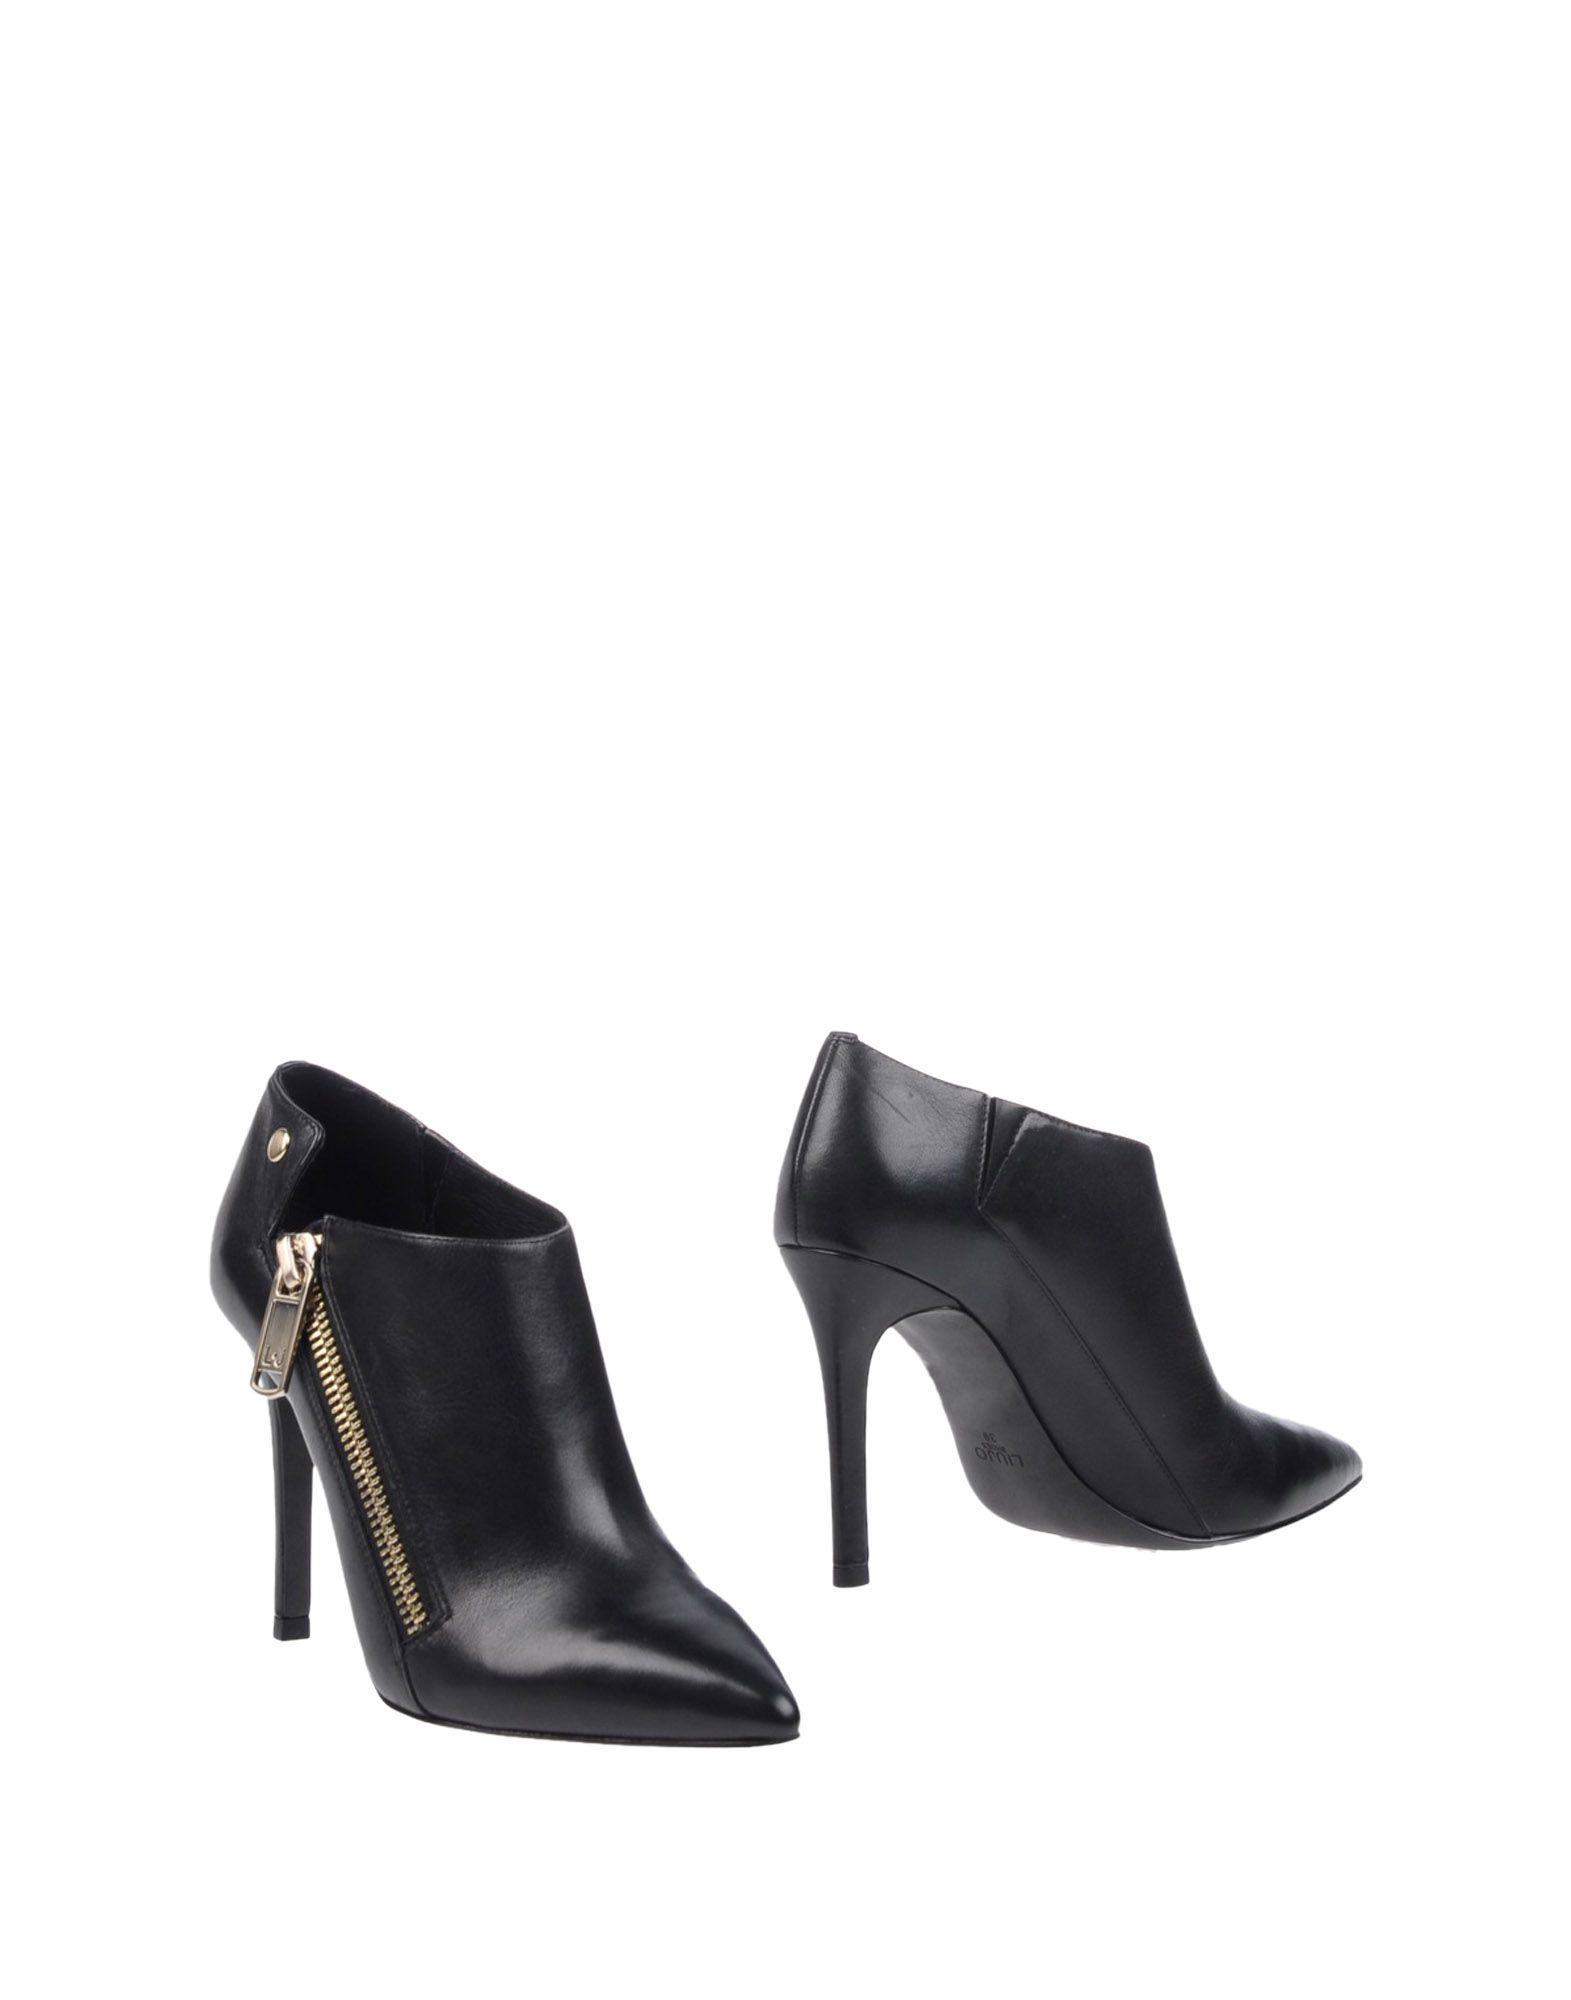 Liu •Jo Shoes Ankle Boot Shoes - Women Liu •Jo Shoes Boot Ankle Boots online on  Australia - 11282069UF 187440